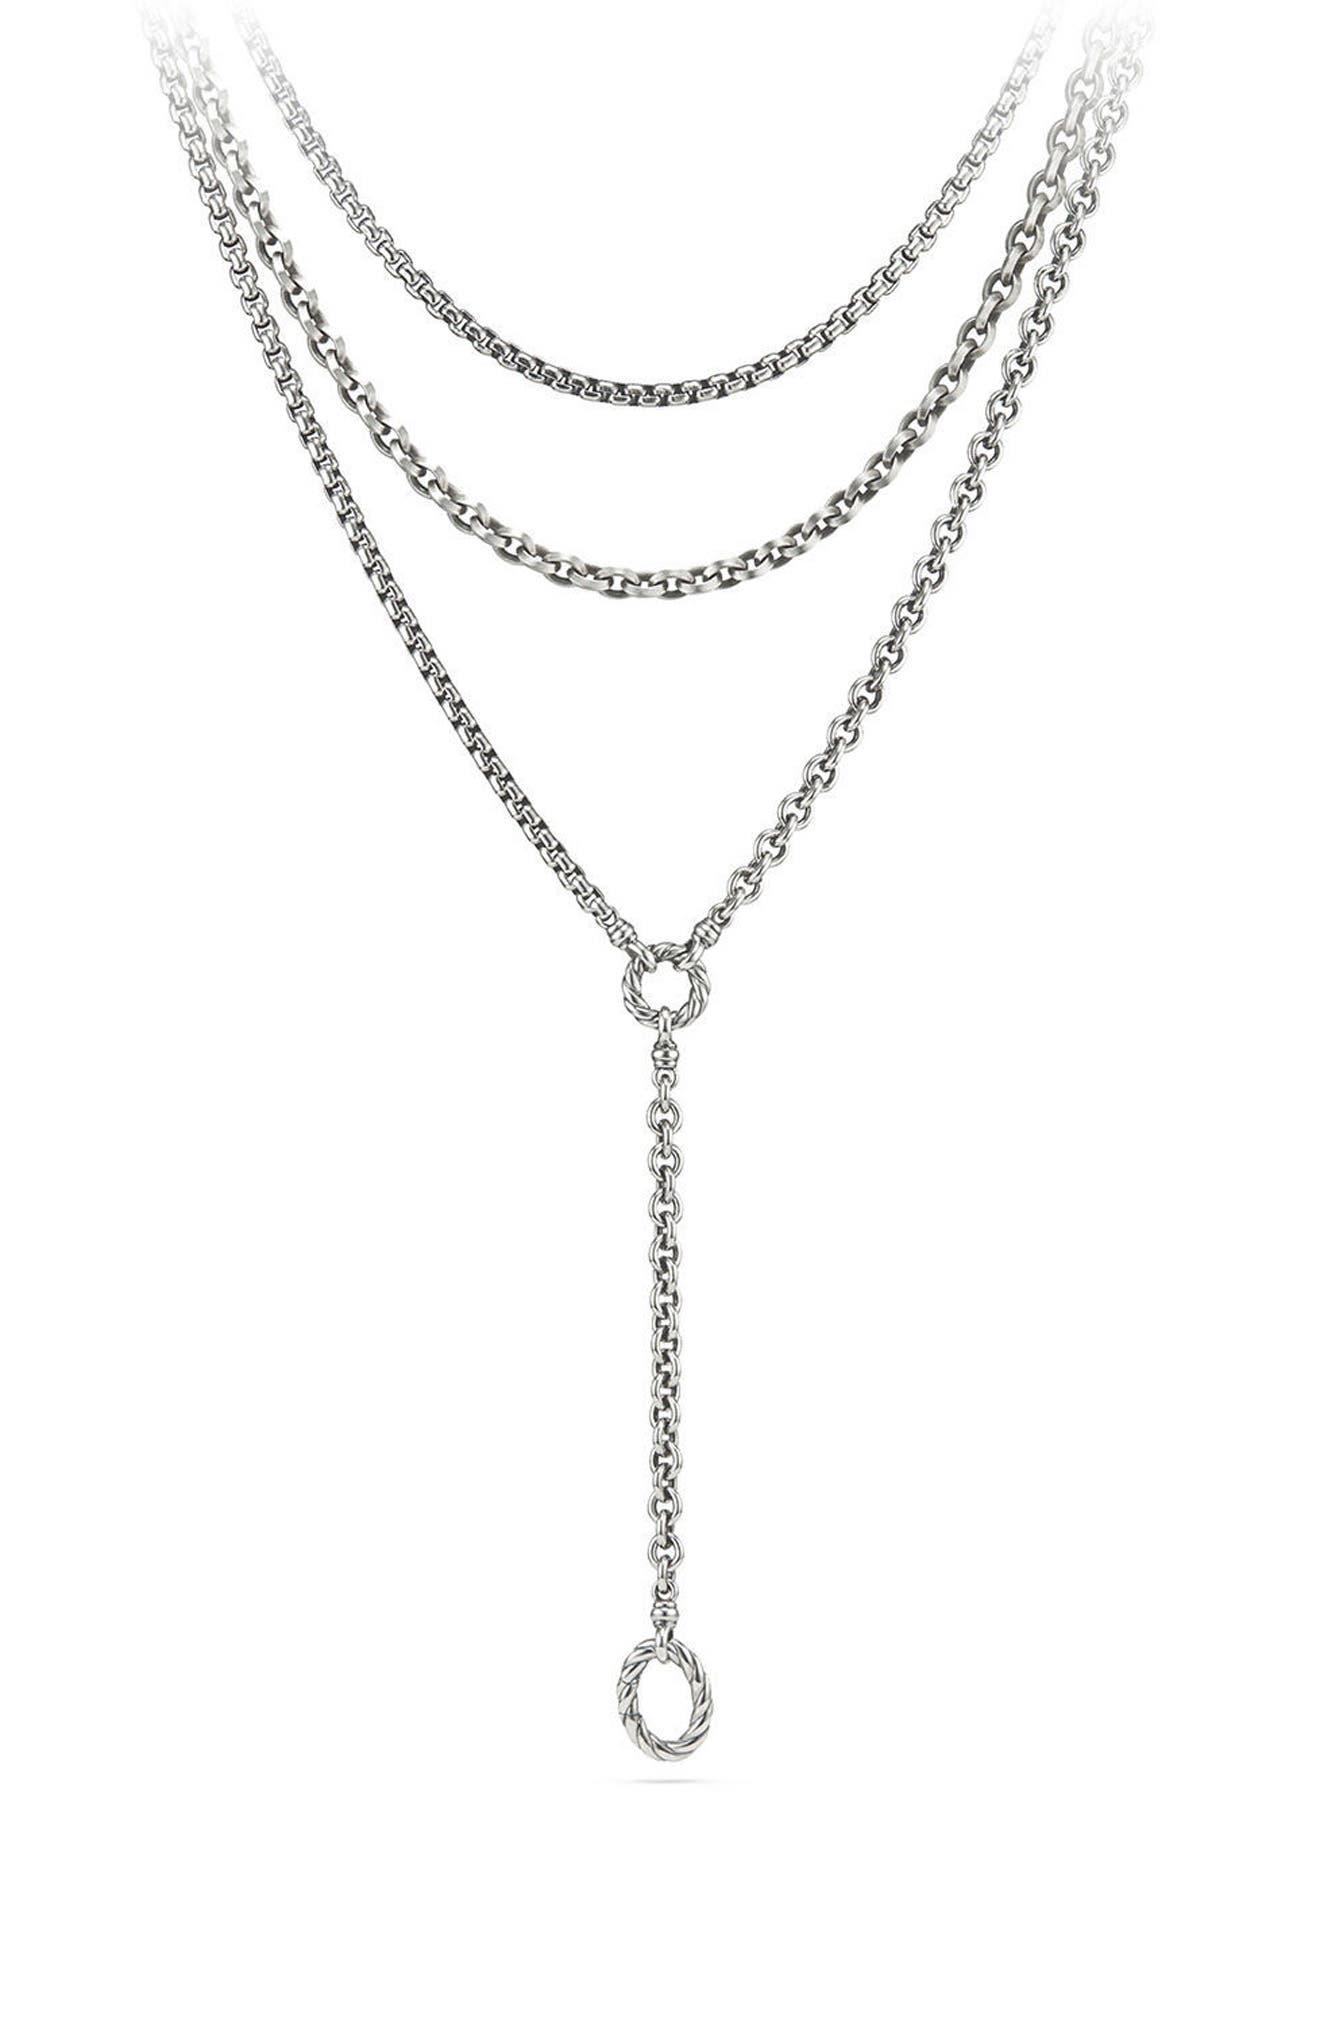 DAVID YURMAN Mixed Chain Y-Necklace